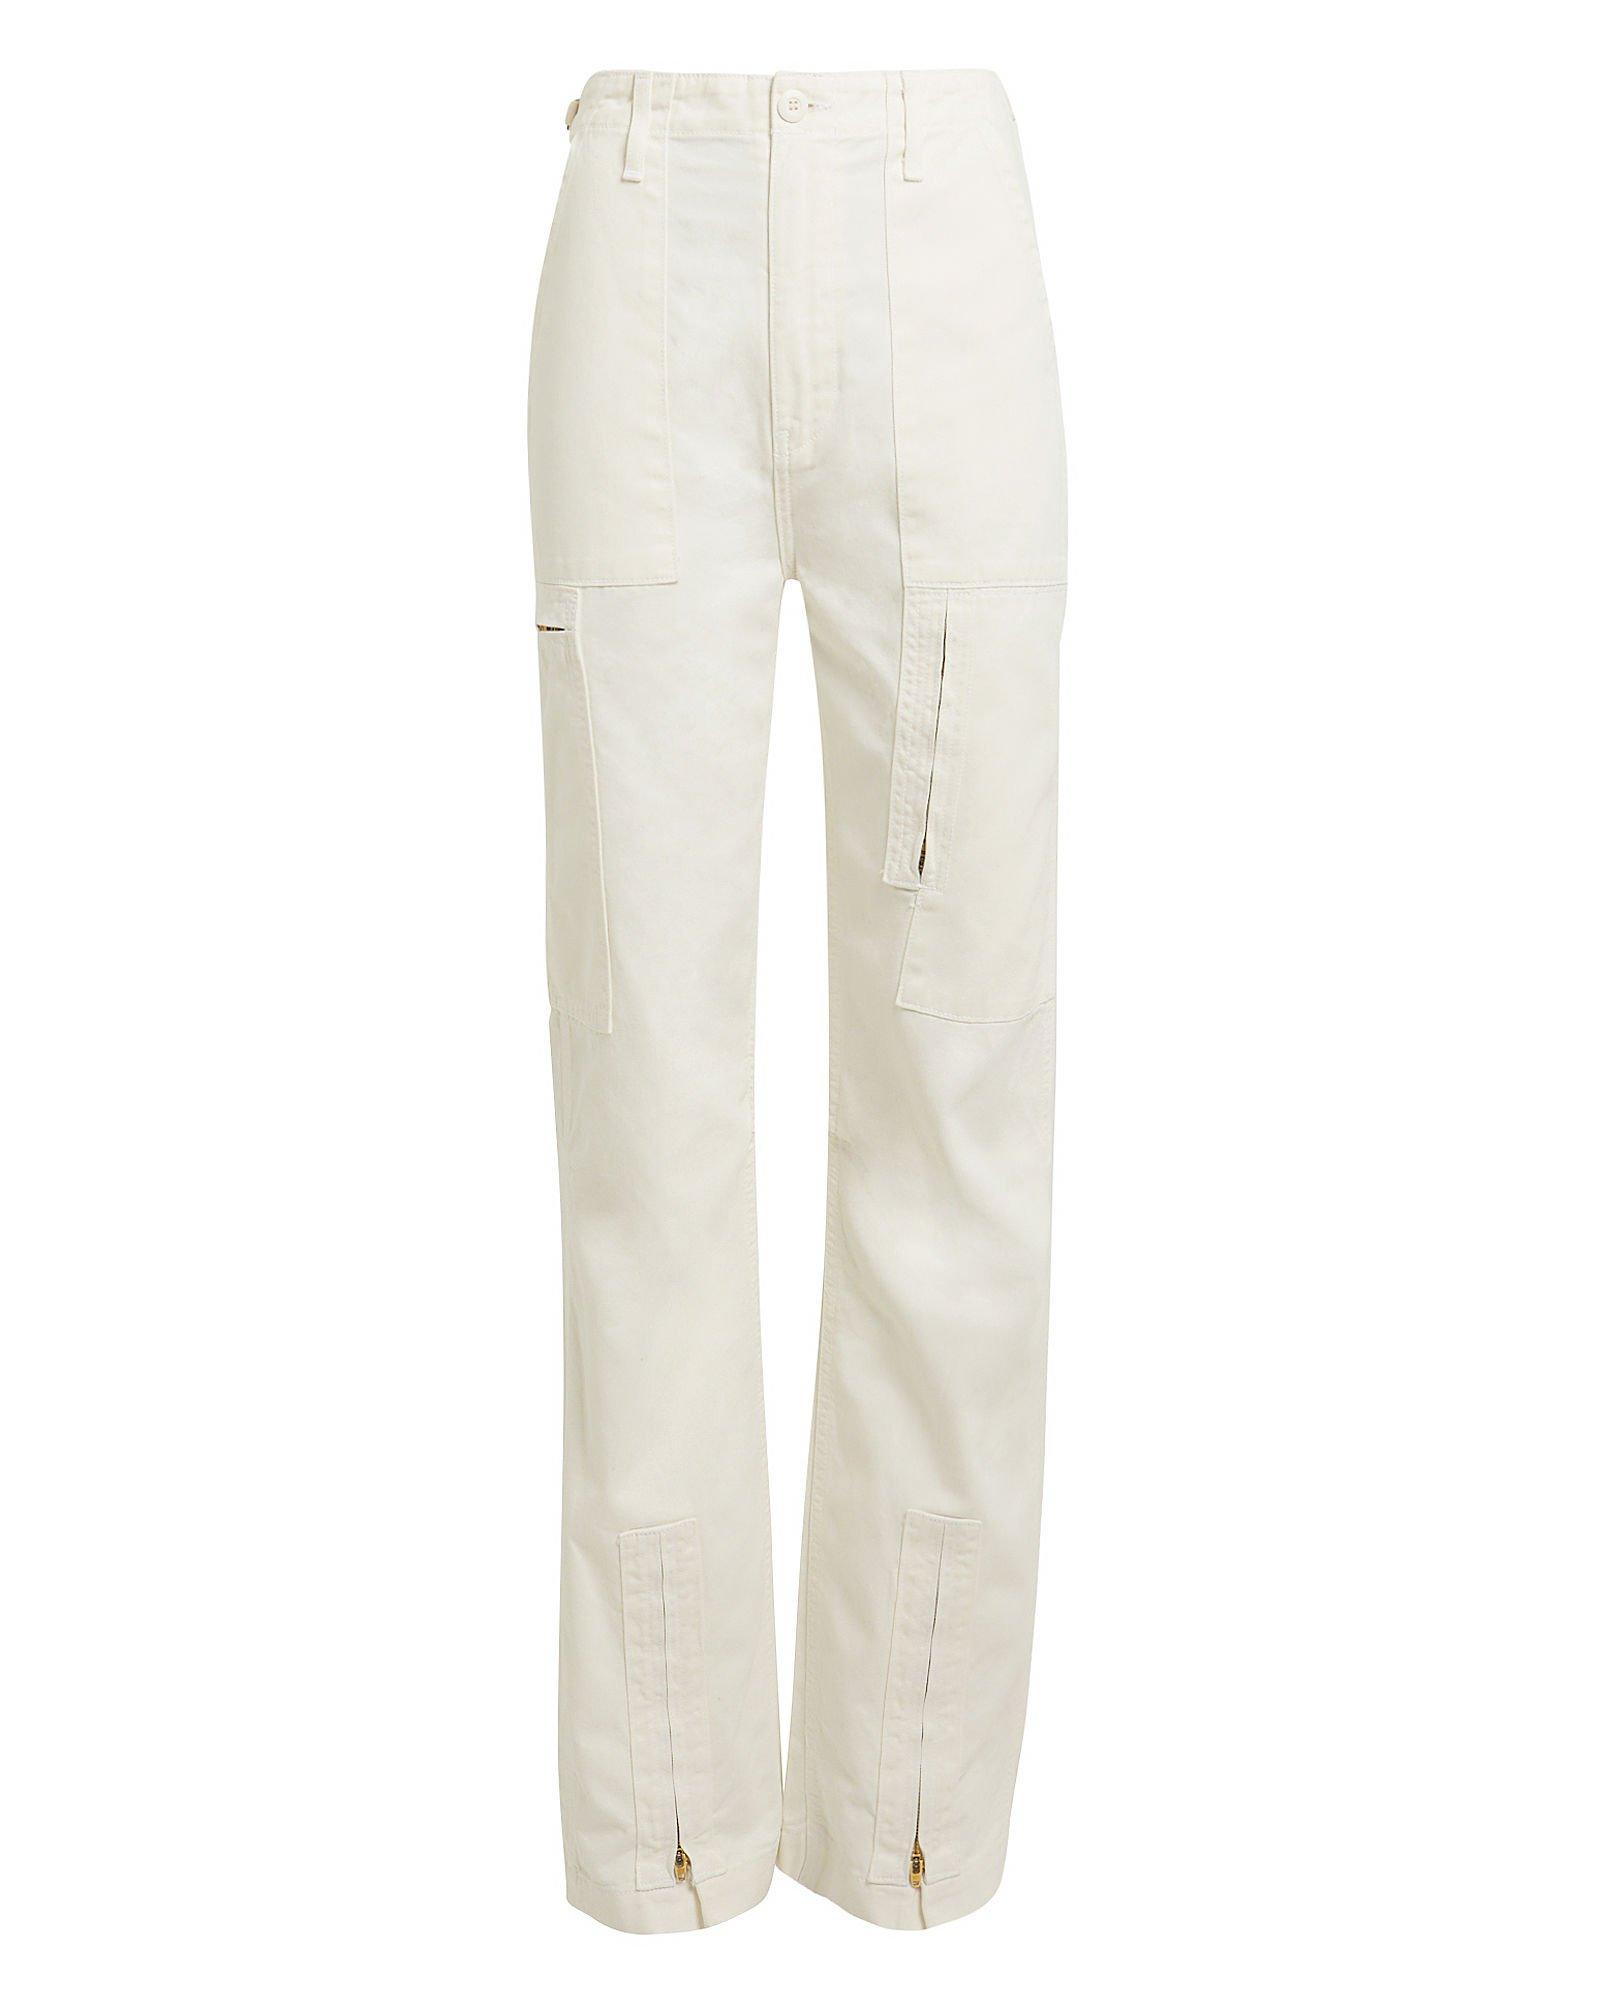 Dirty White Cargo Pants